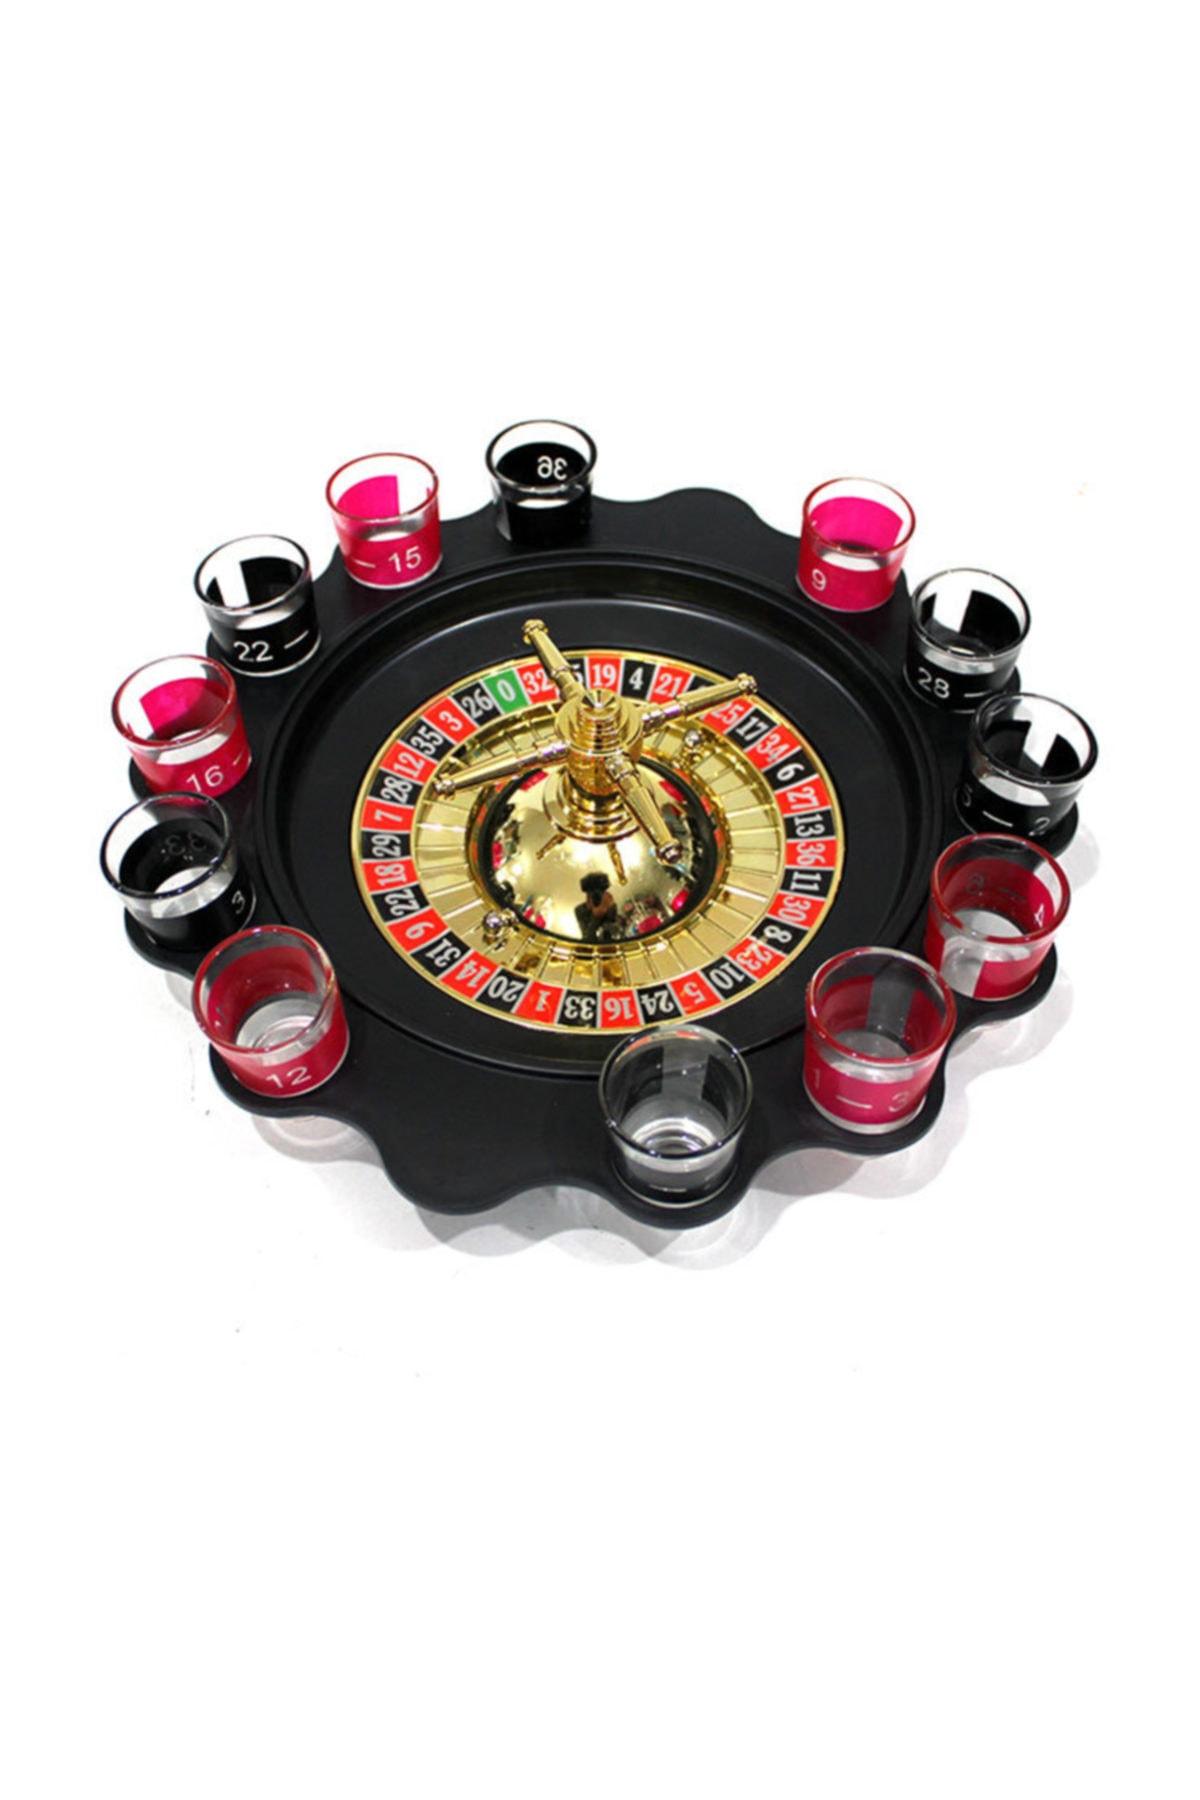 Rus Ruleti Drinking Roulette Shot Bardaklı Tekila Içki Oyun Seti